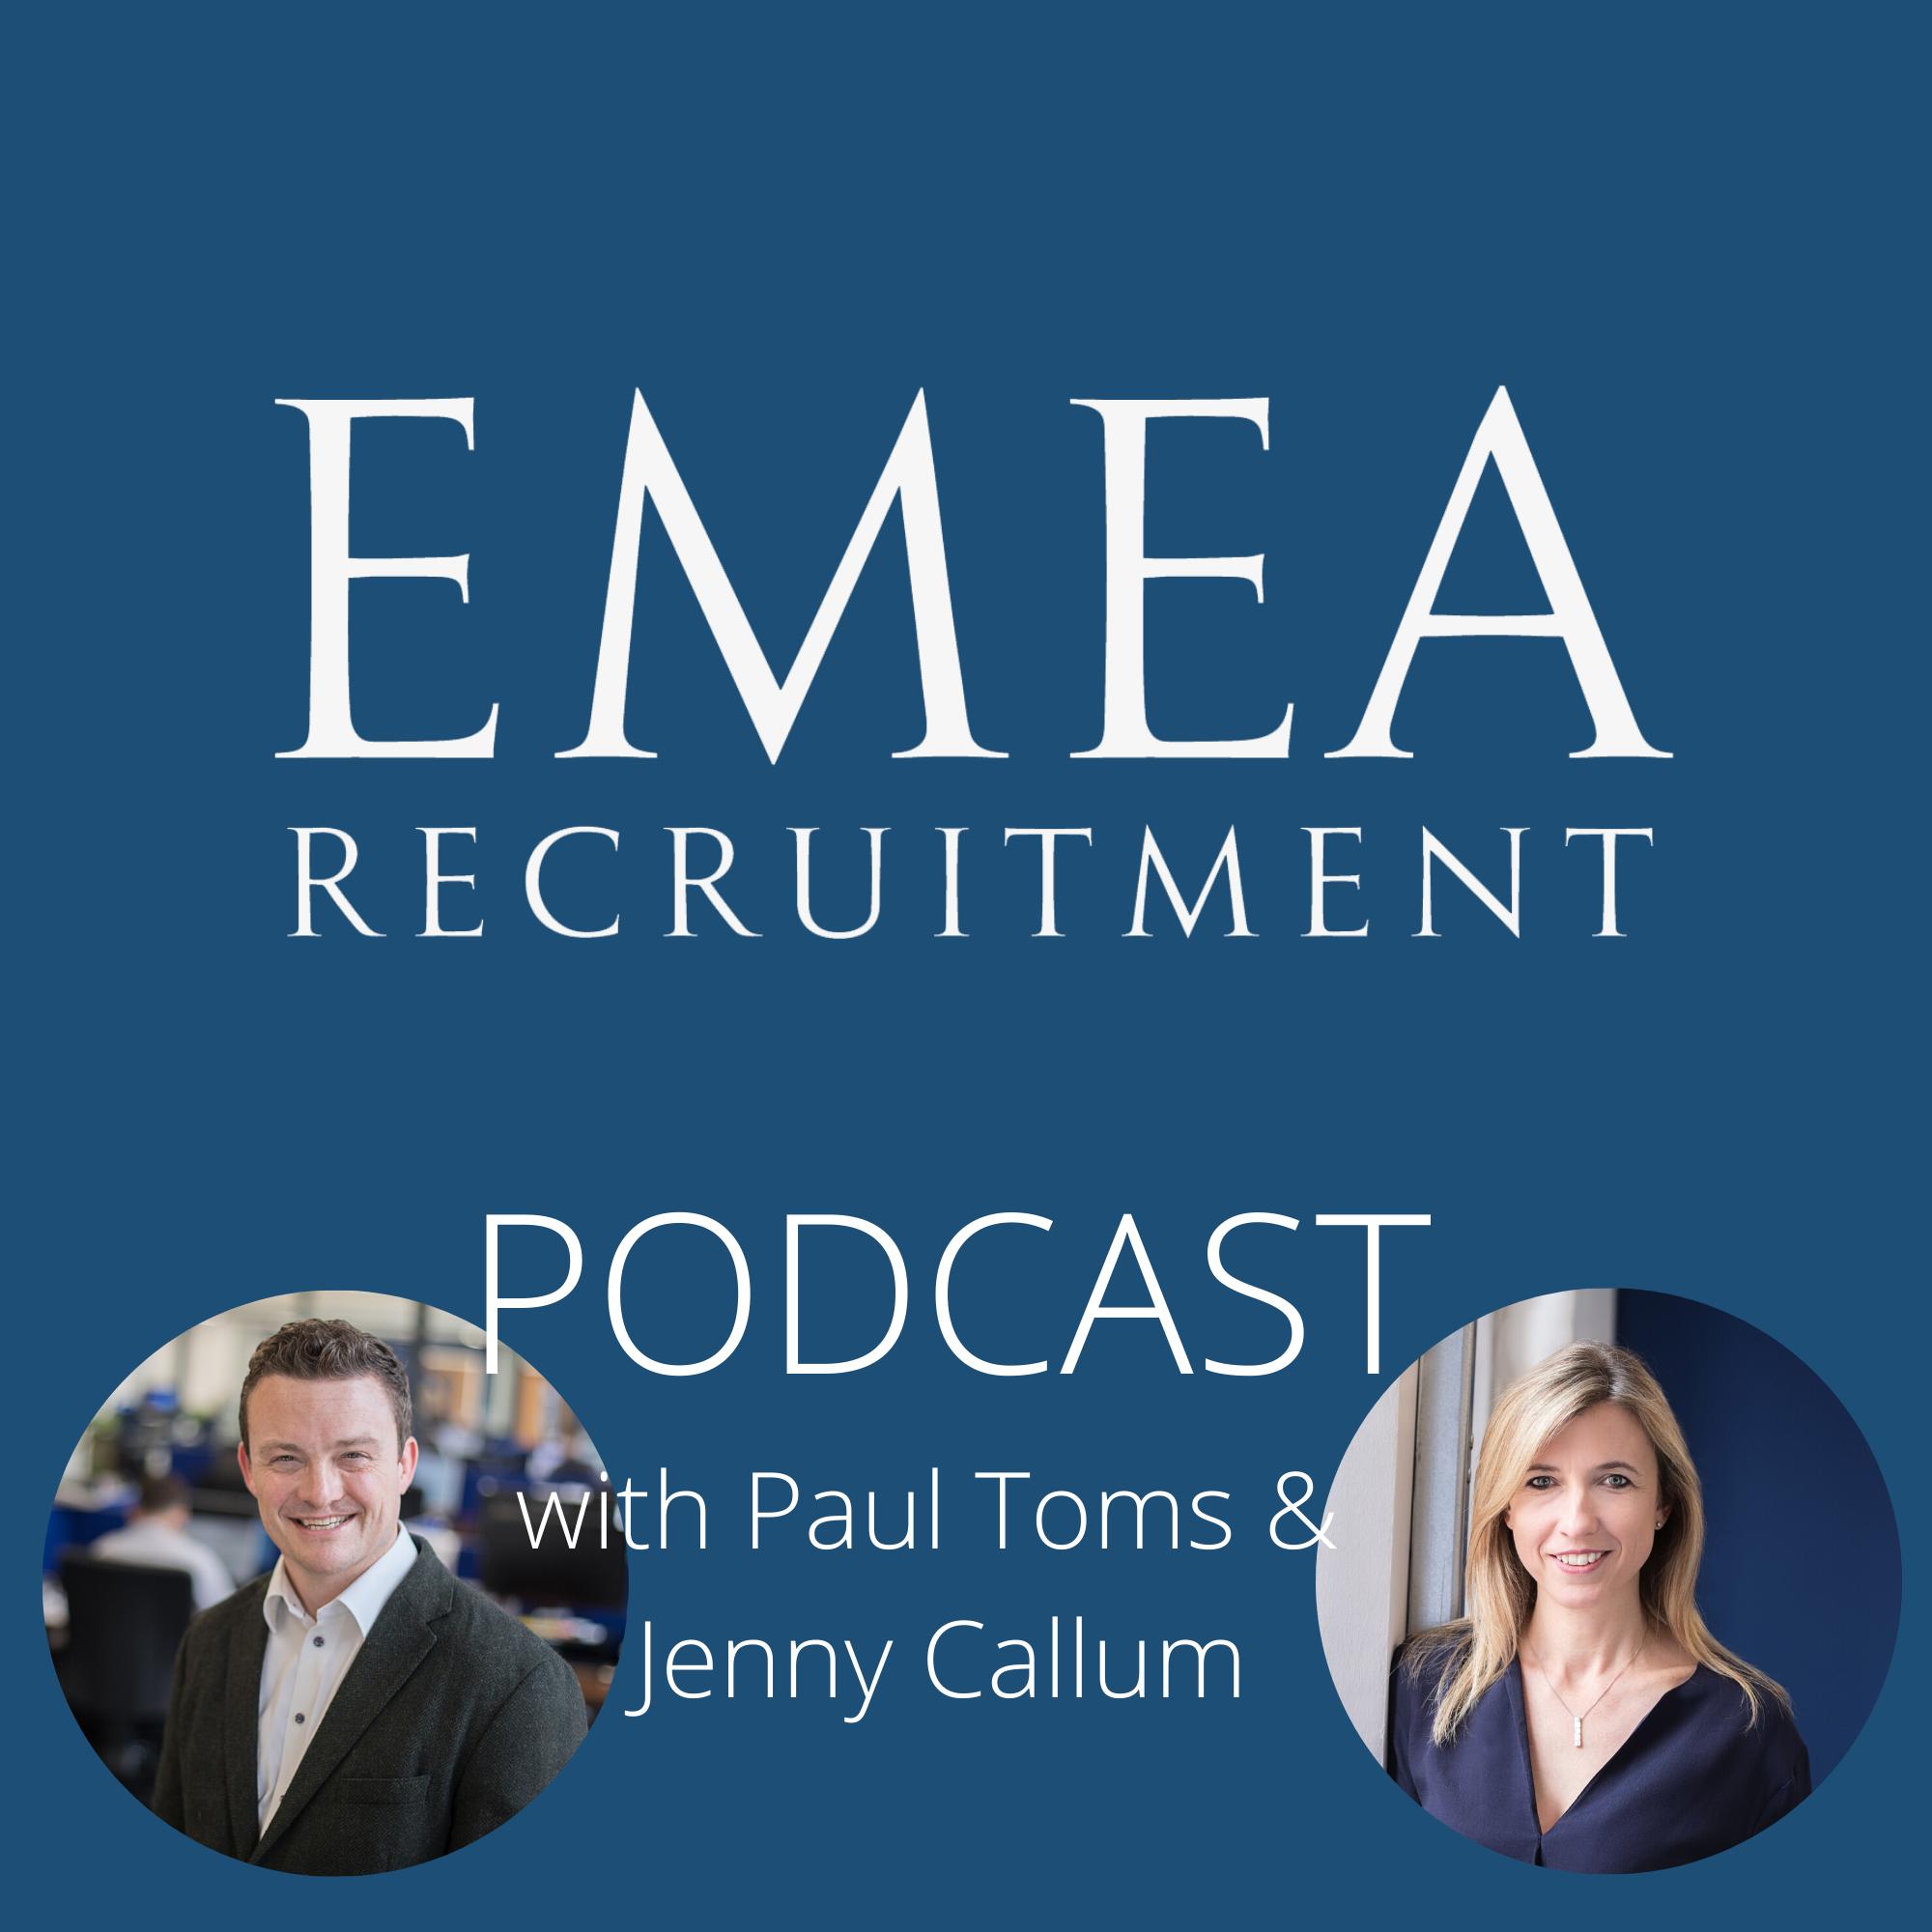 EMEA Recruitment Podcast #67 - Greg Savage